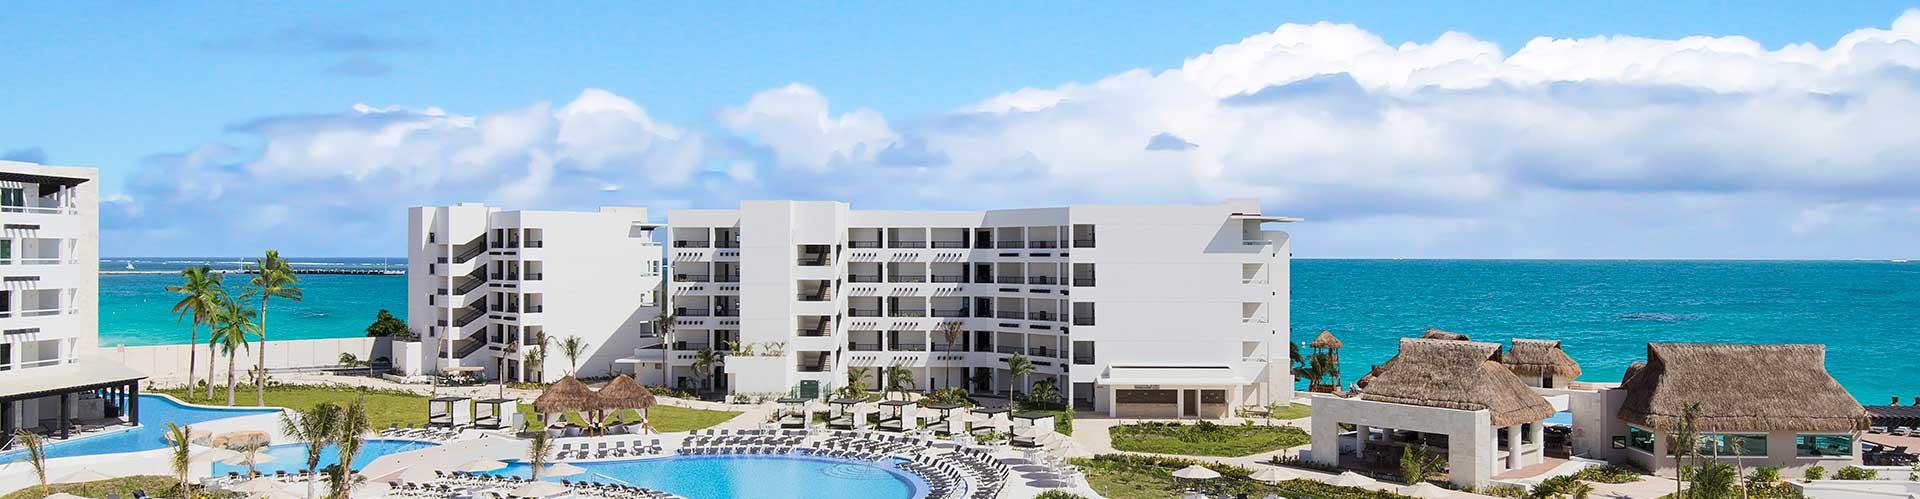 Ventus Resort